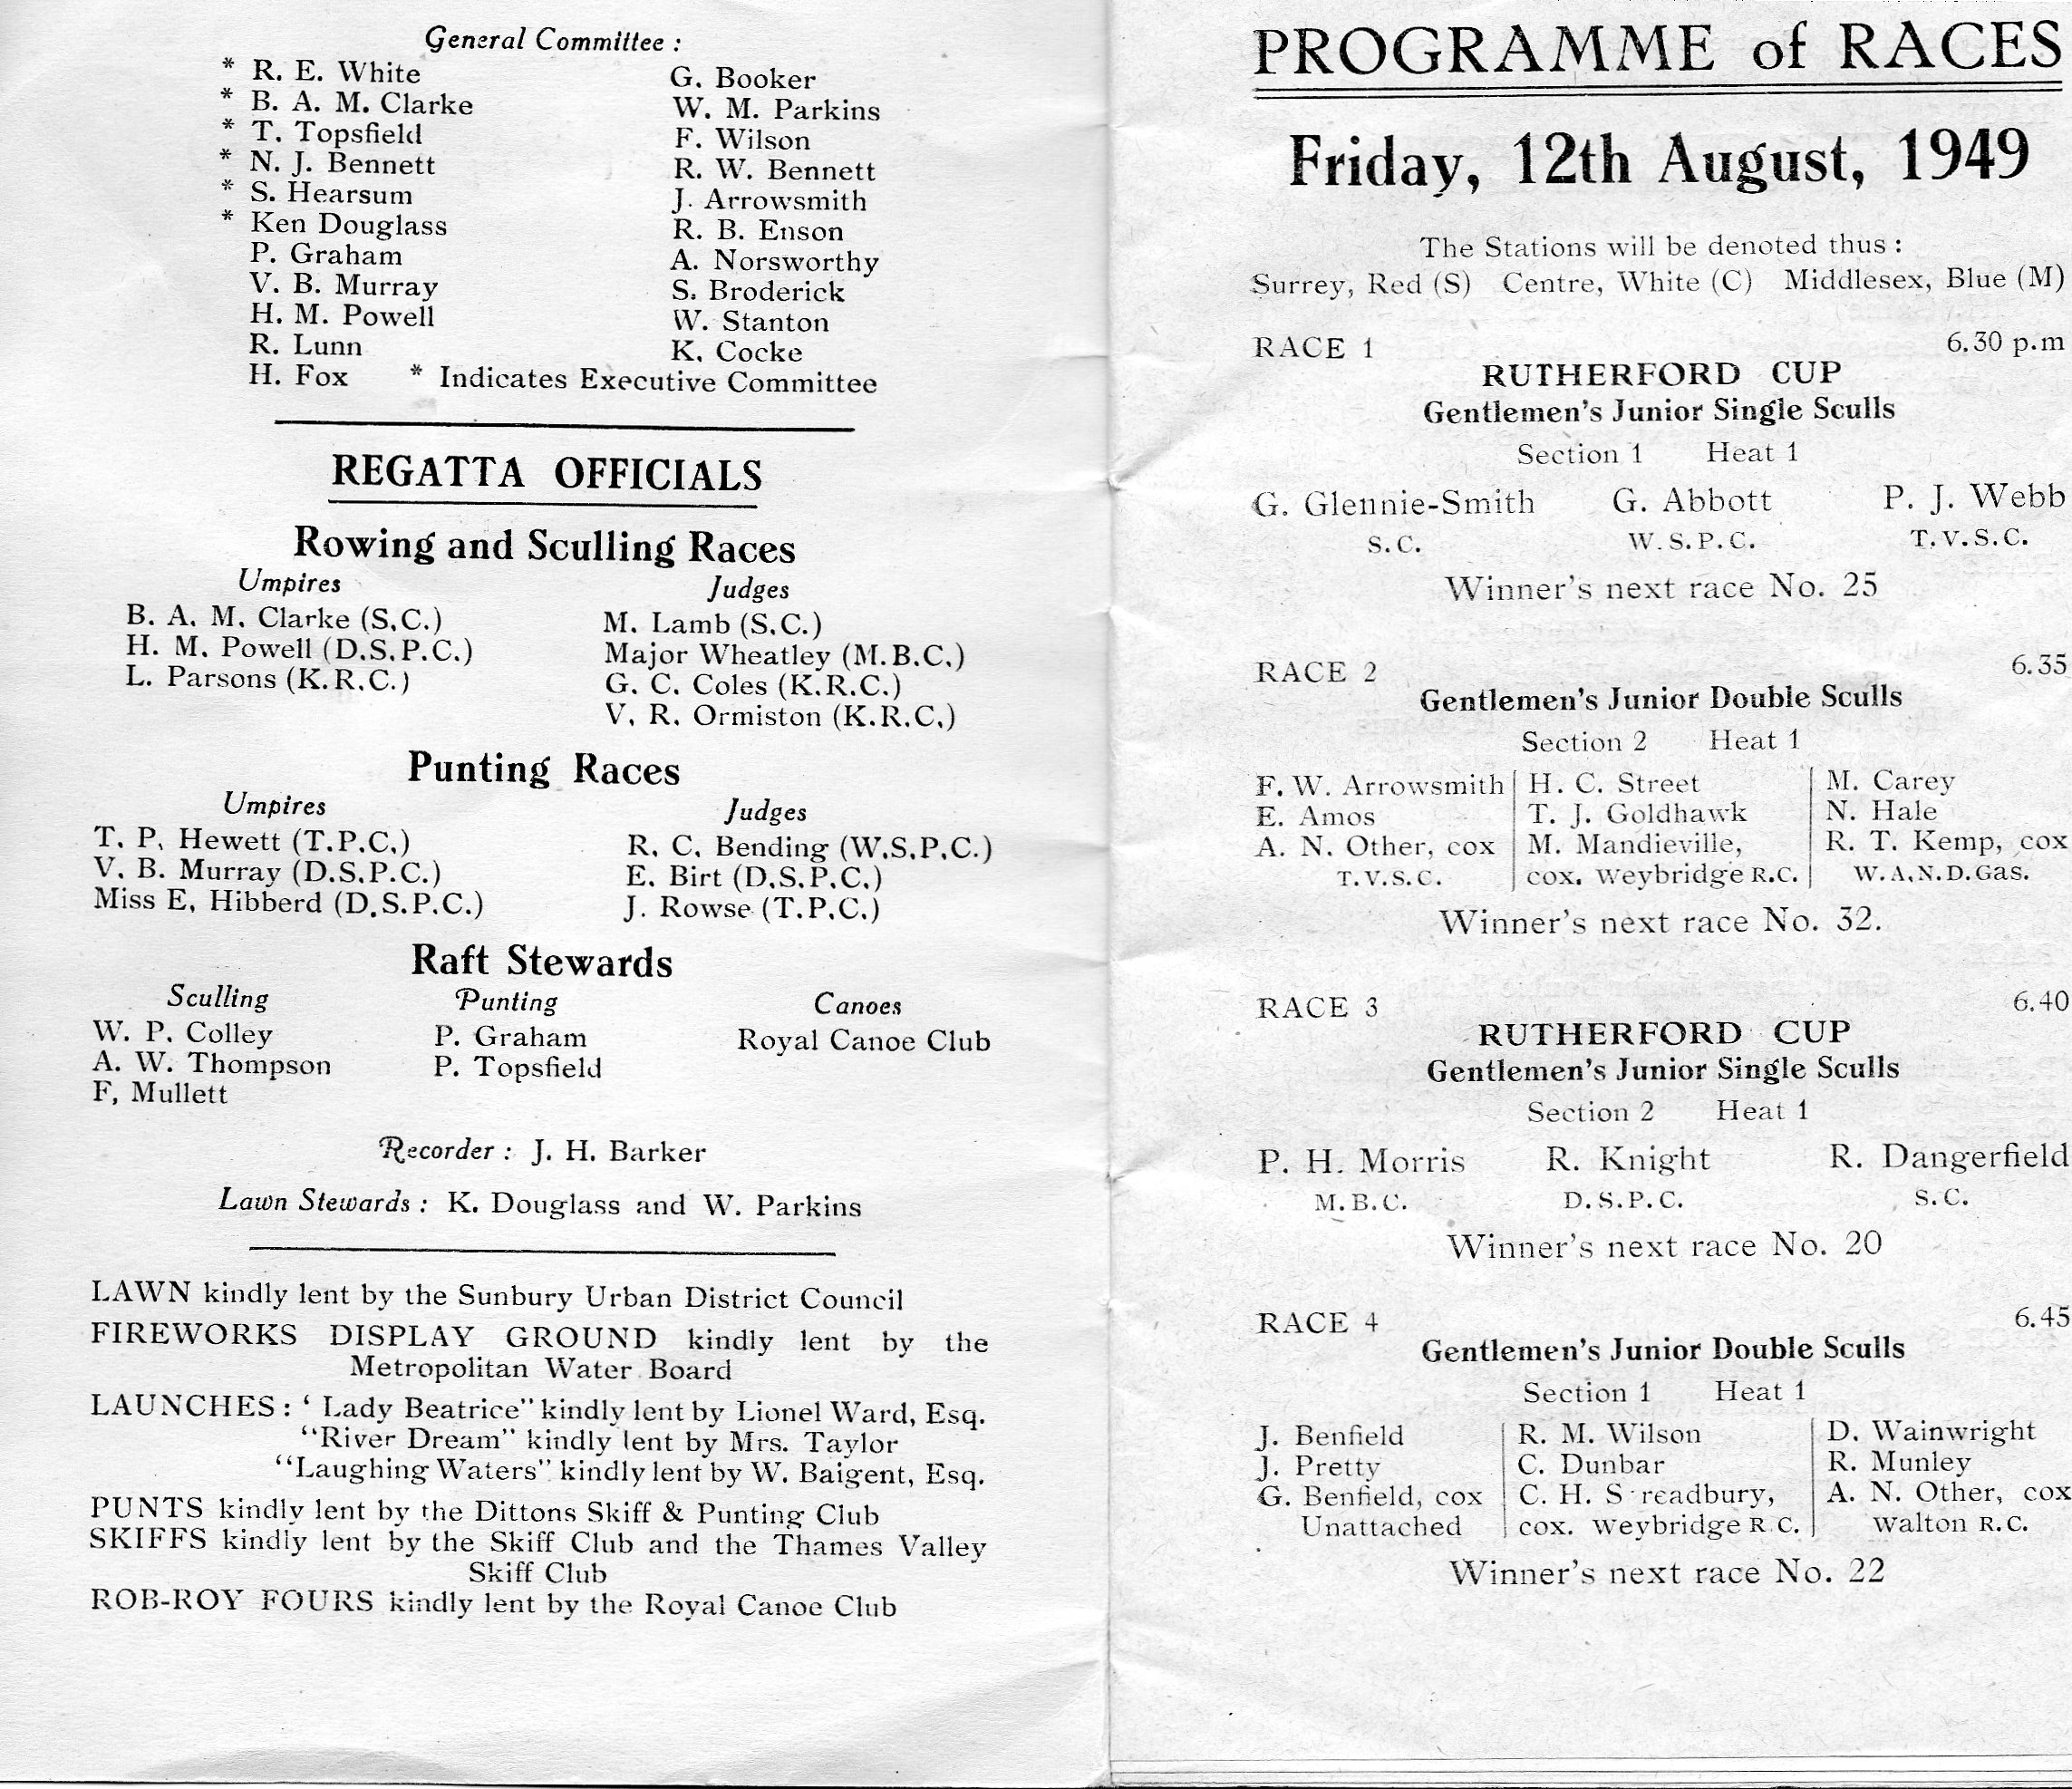 Programme 1949.1.jpg